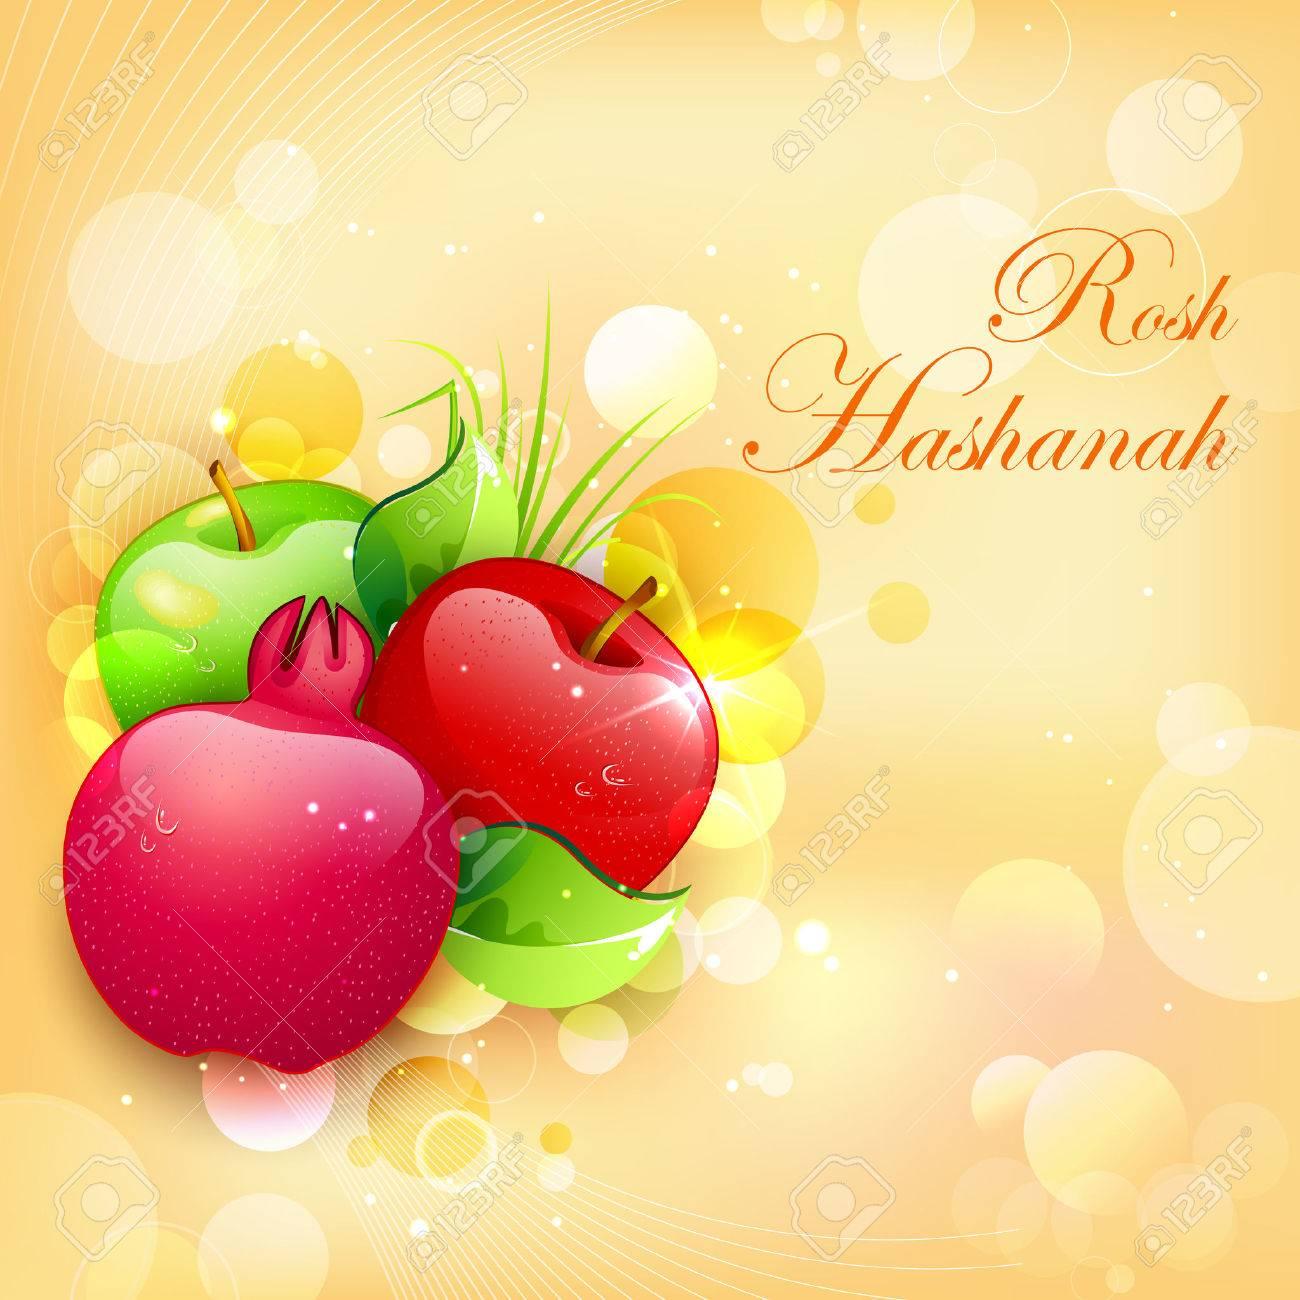 Rosh hashanah stock photos royalty free business images illustration of rosh hashanah background with pomegranate and apple kristyandbryce Choice Image